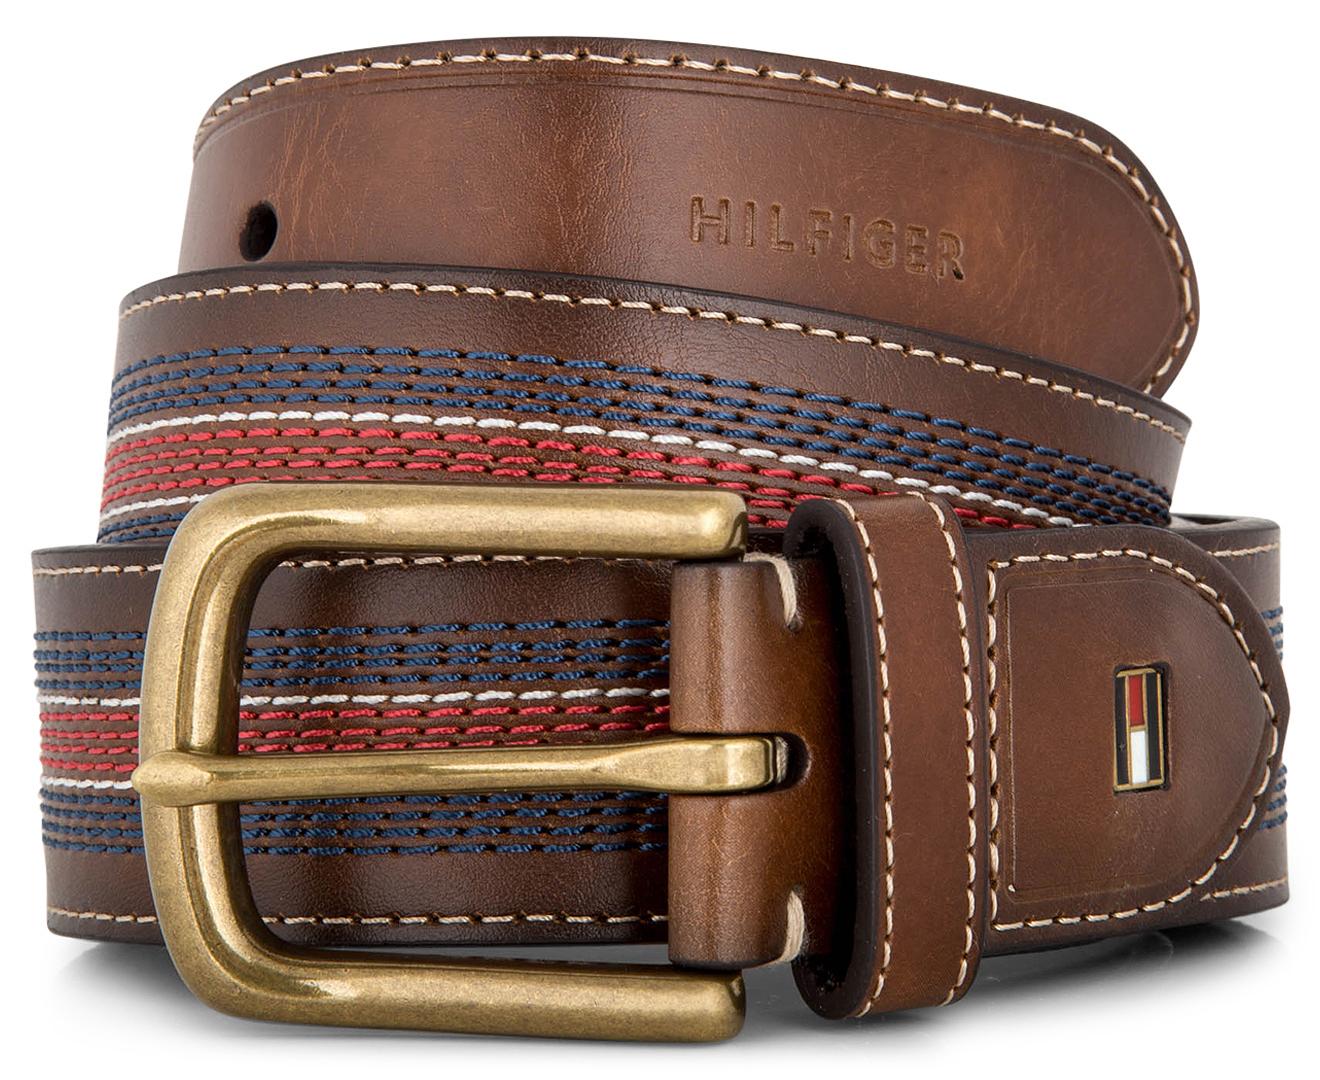 1b9f06e545e2 ceinture Tommy Hilfiger belt cuir luxury luxe fashion mode accessory  accessoire leather best top meilleur 2017